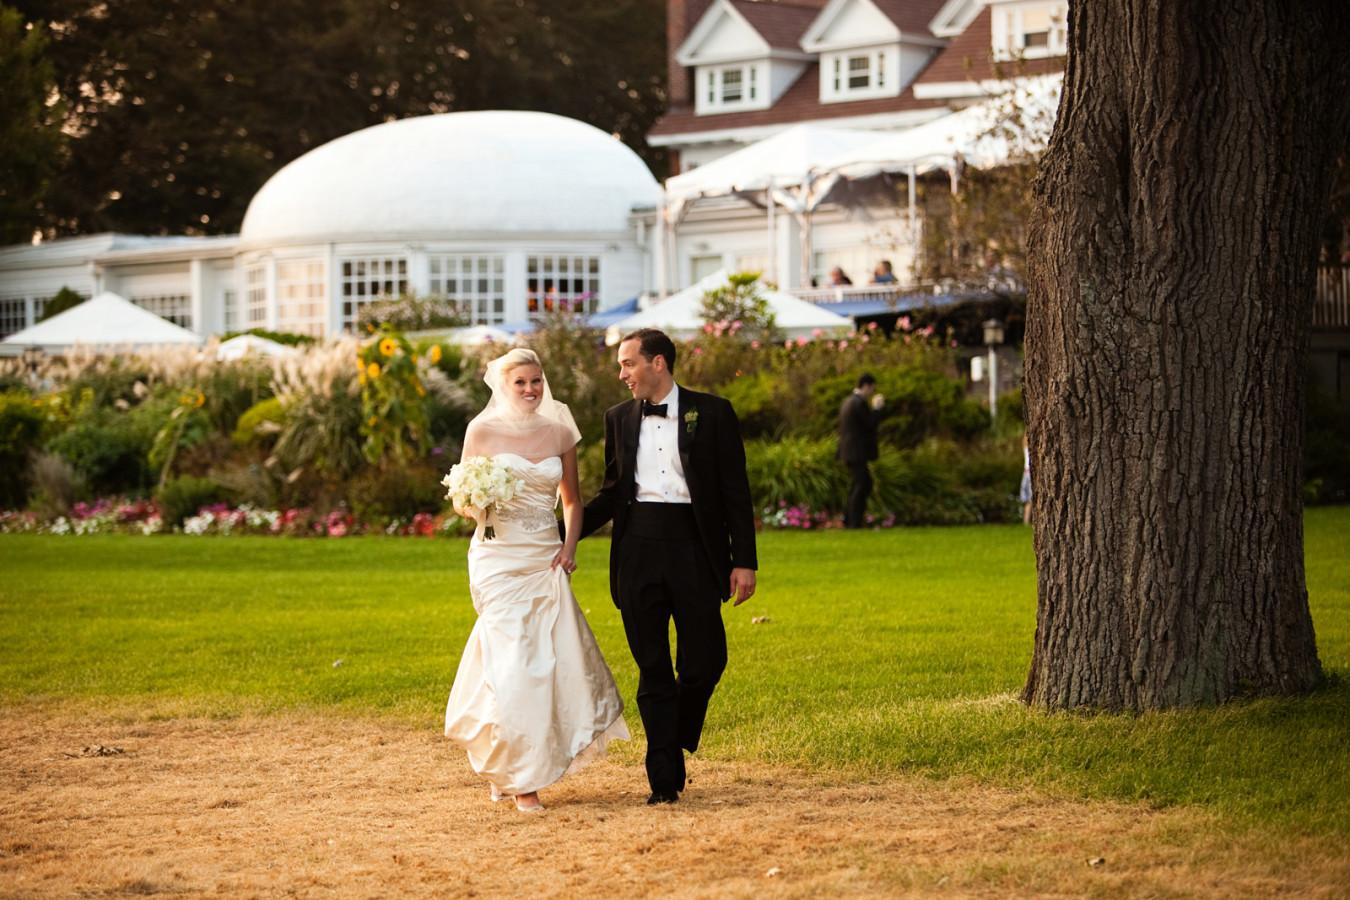 Inn At Longshore CT Wedding Photographer Bruce Plotkin